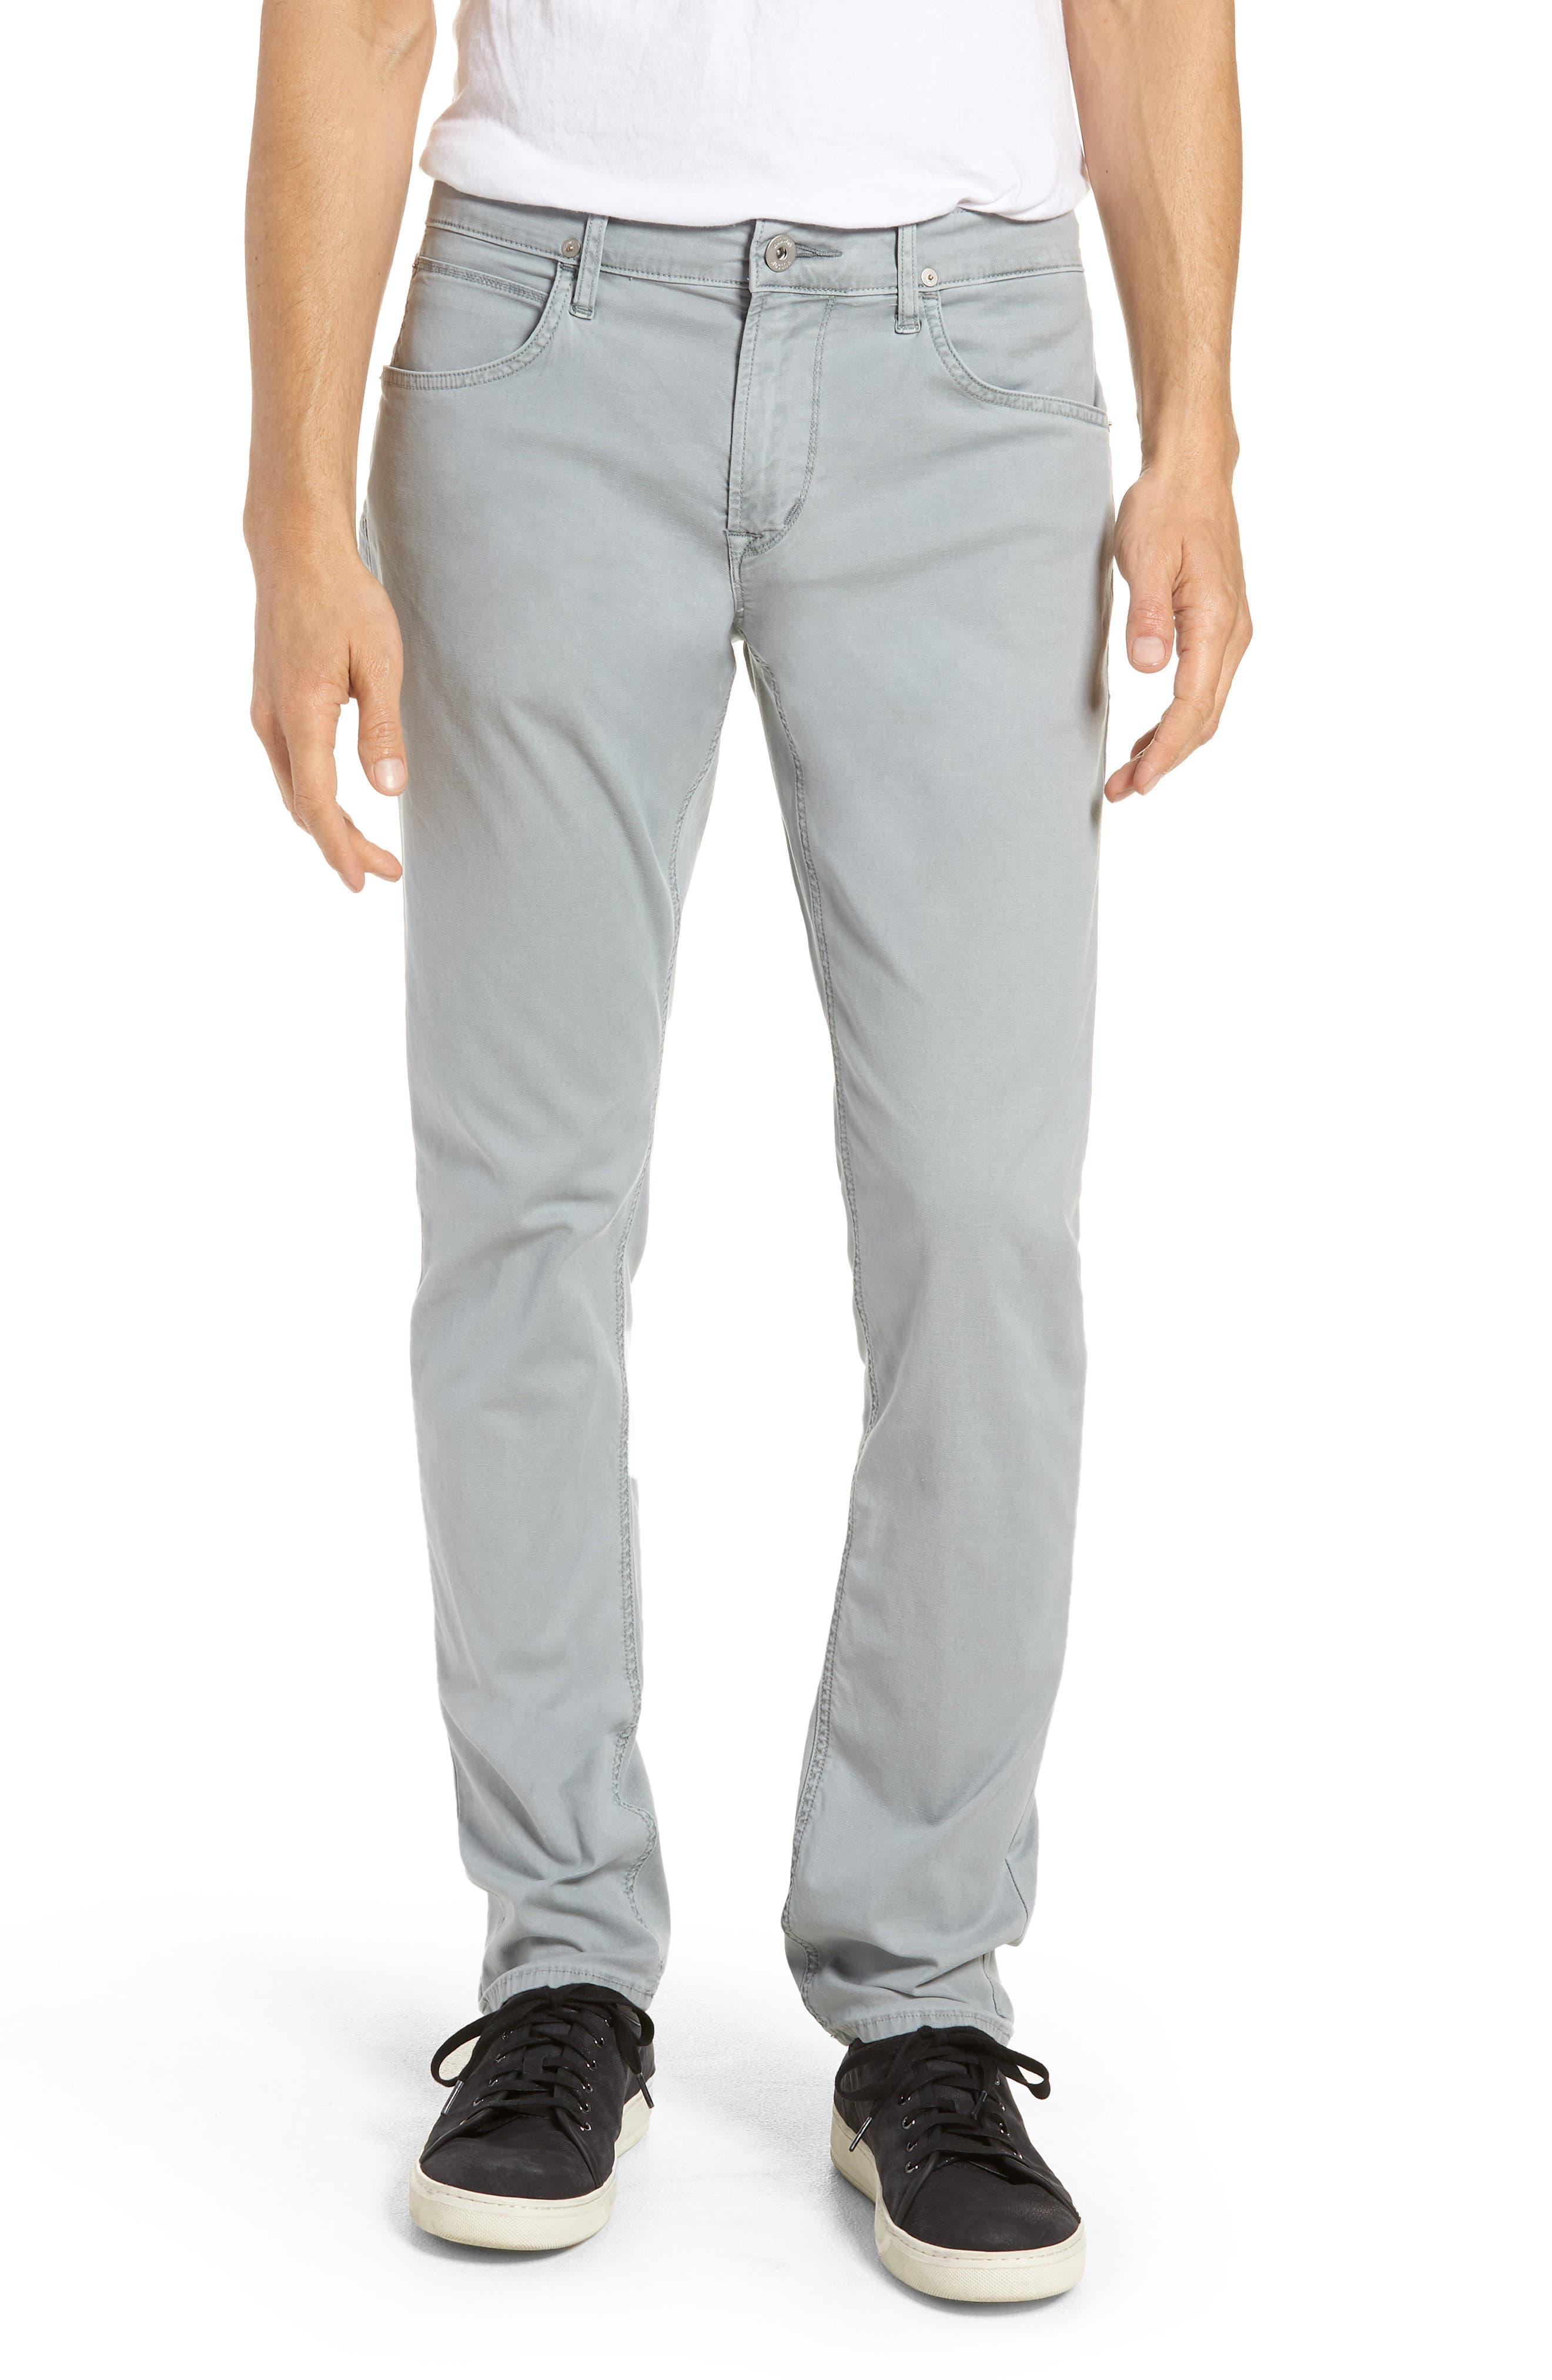 Blake Slim Fit Jeans,                             Main thumbnail 1, color,                             Steel Blue